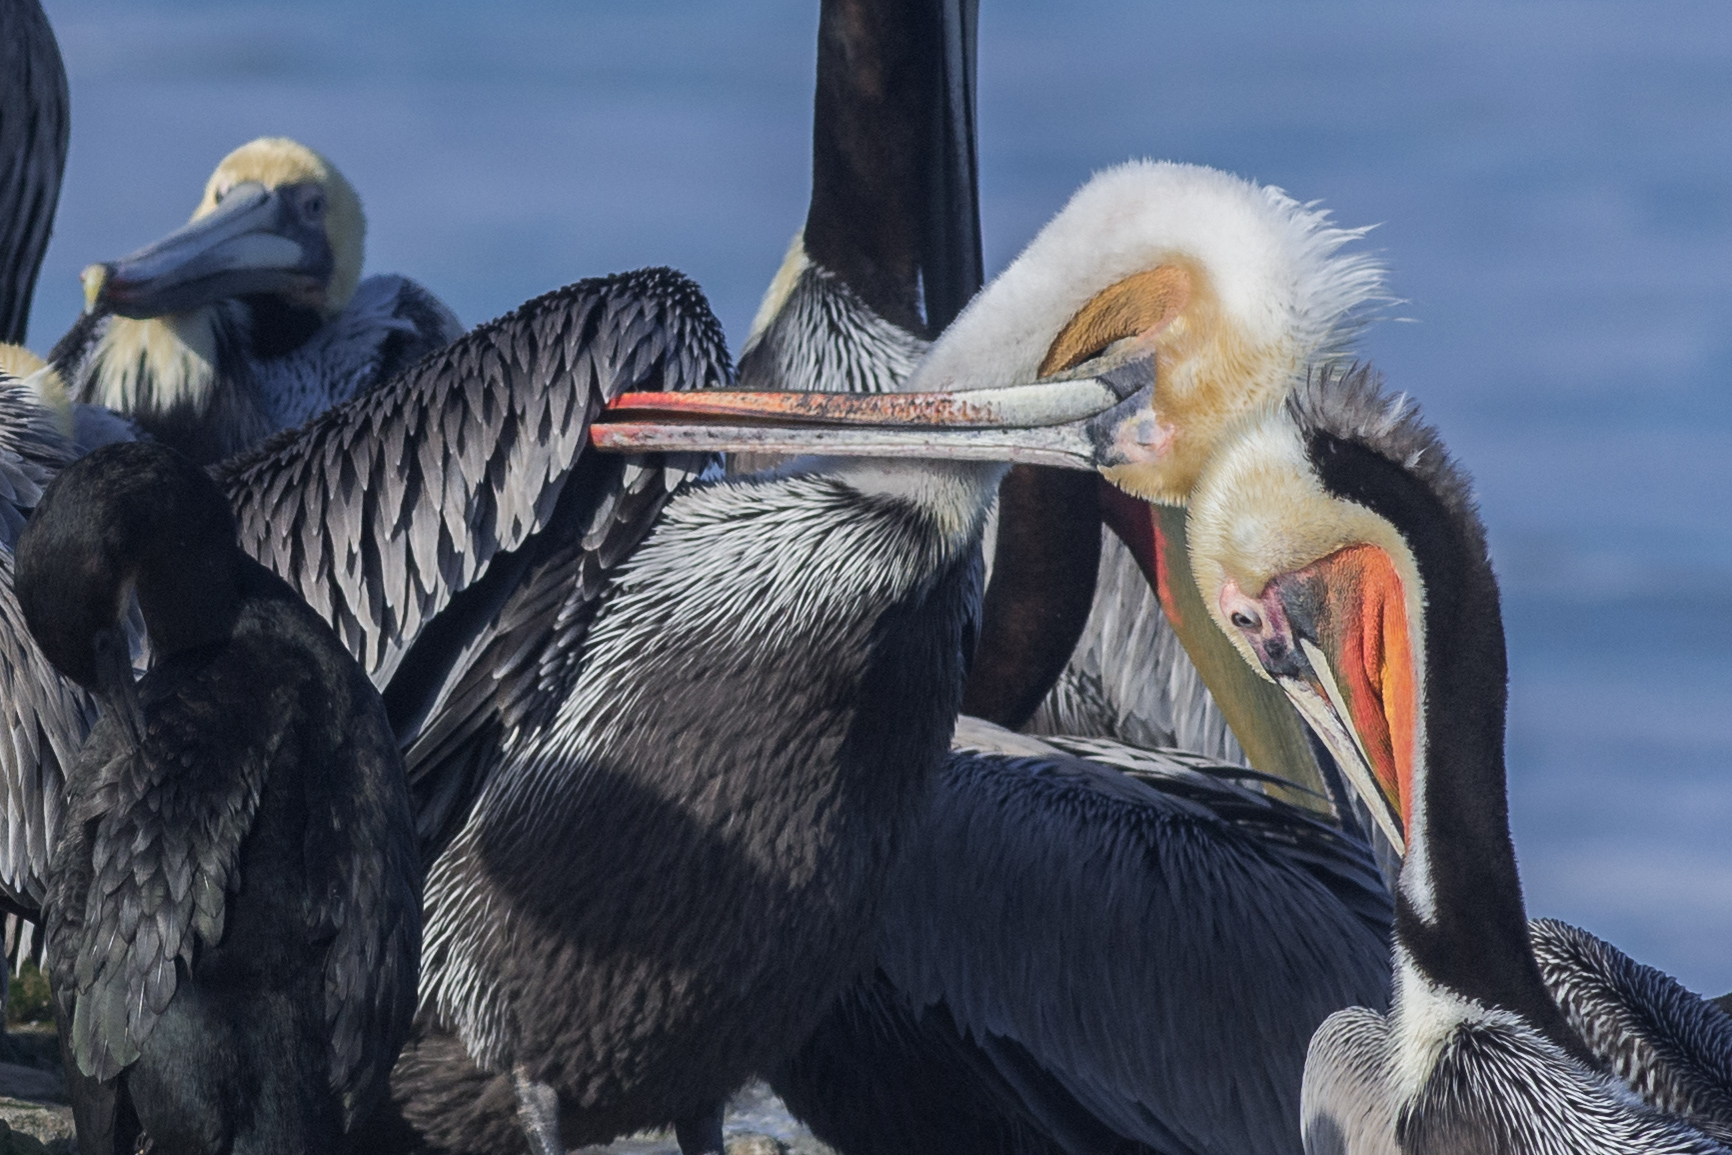 Brown Pelican (Pelecanus occidentalis) at Natural Bridges SB  EQ: D7200, 300mm f/2.8  Taken: 2-4-2016 at 10:27   Settings: 450mm (35mm eqiv), 1/1000s, f/6.3, ISO250, +1/3EV  Conditions: Sunny